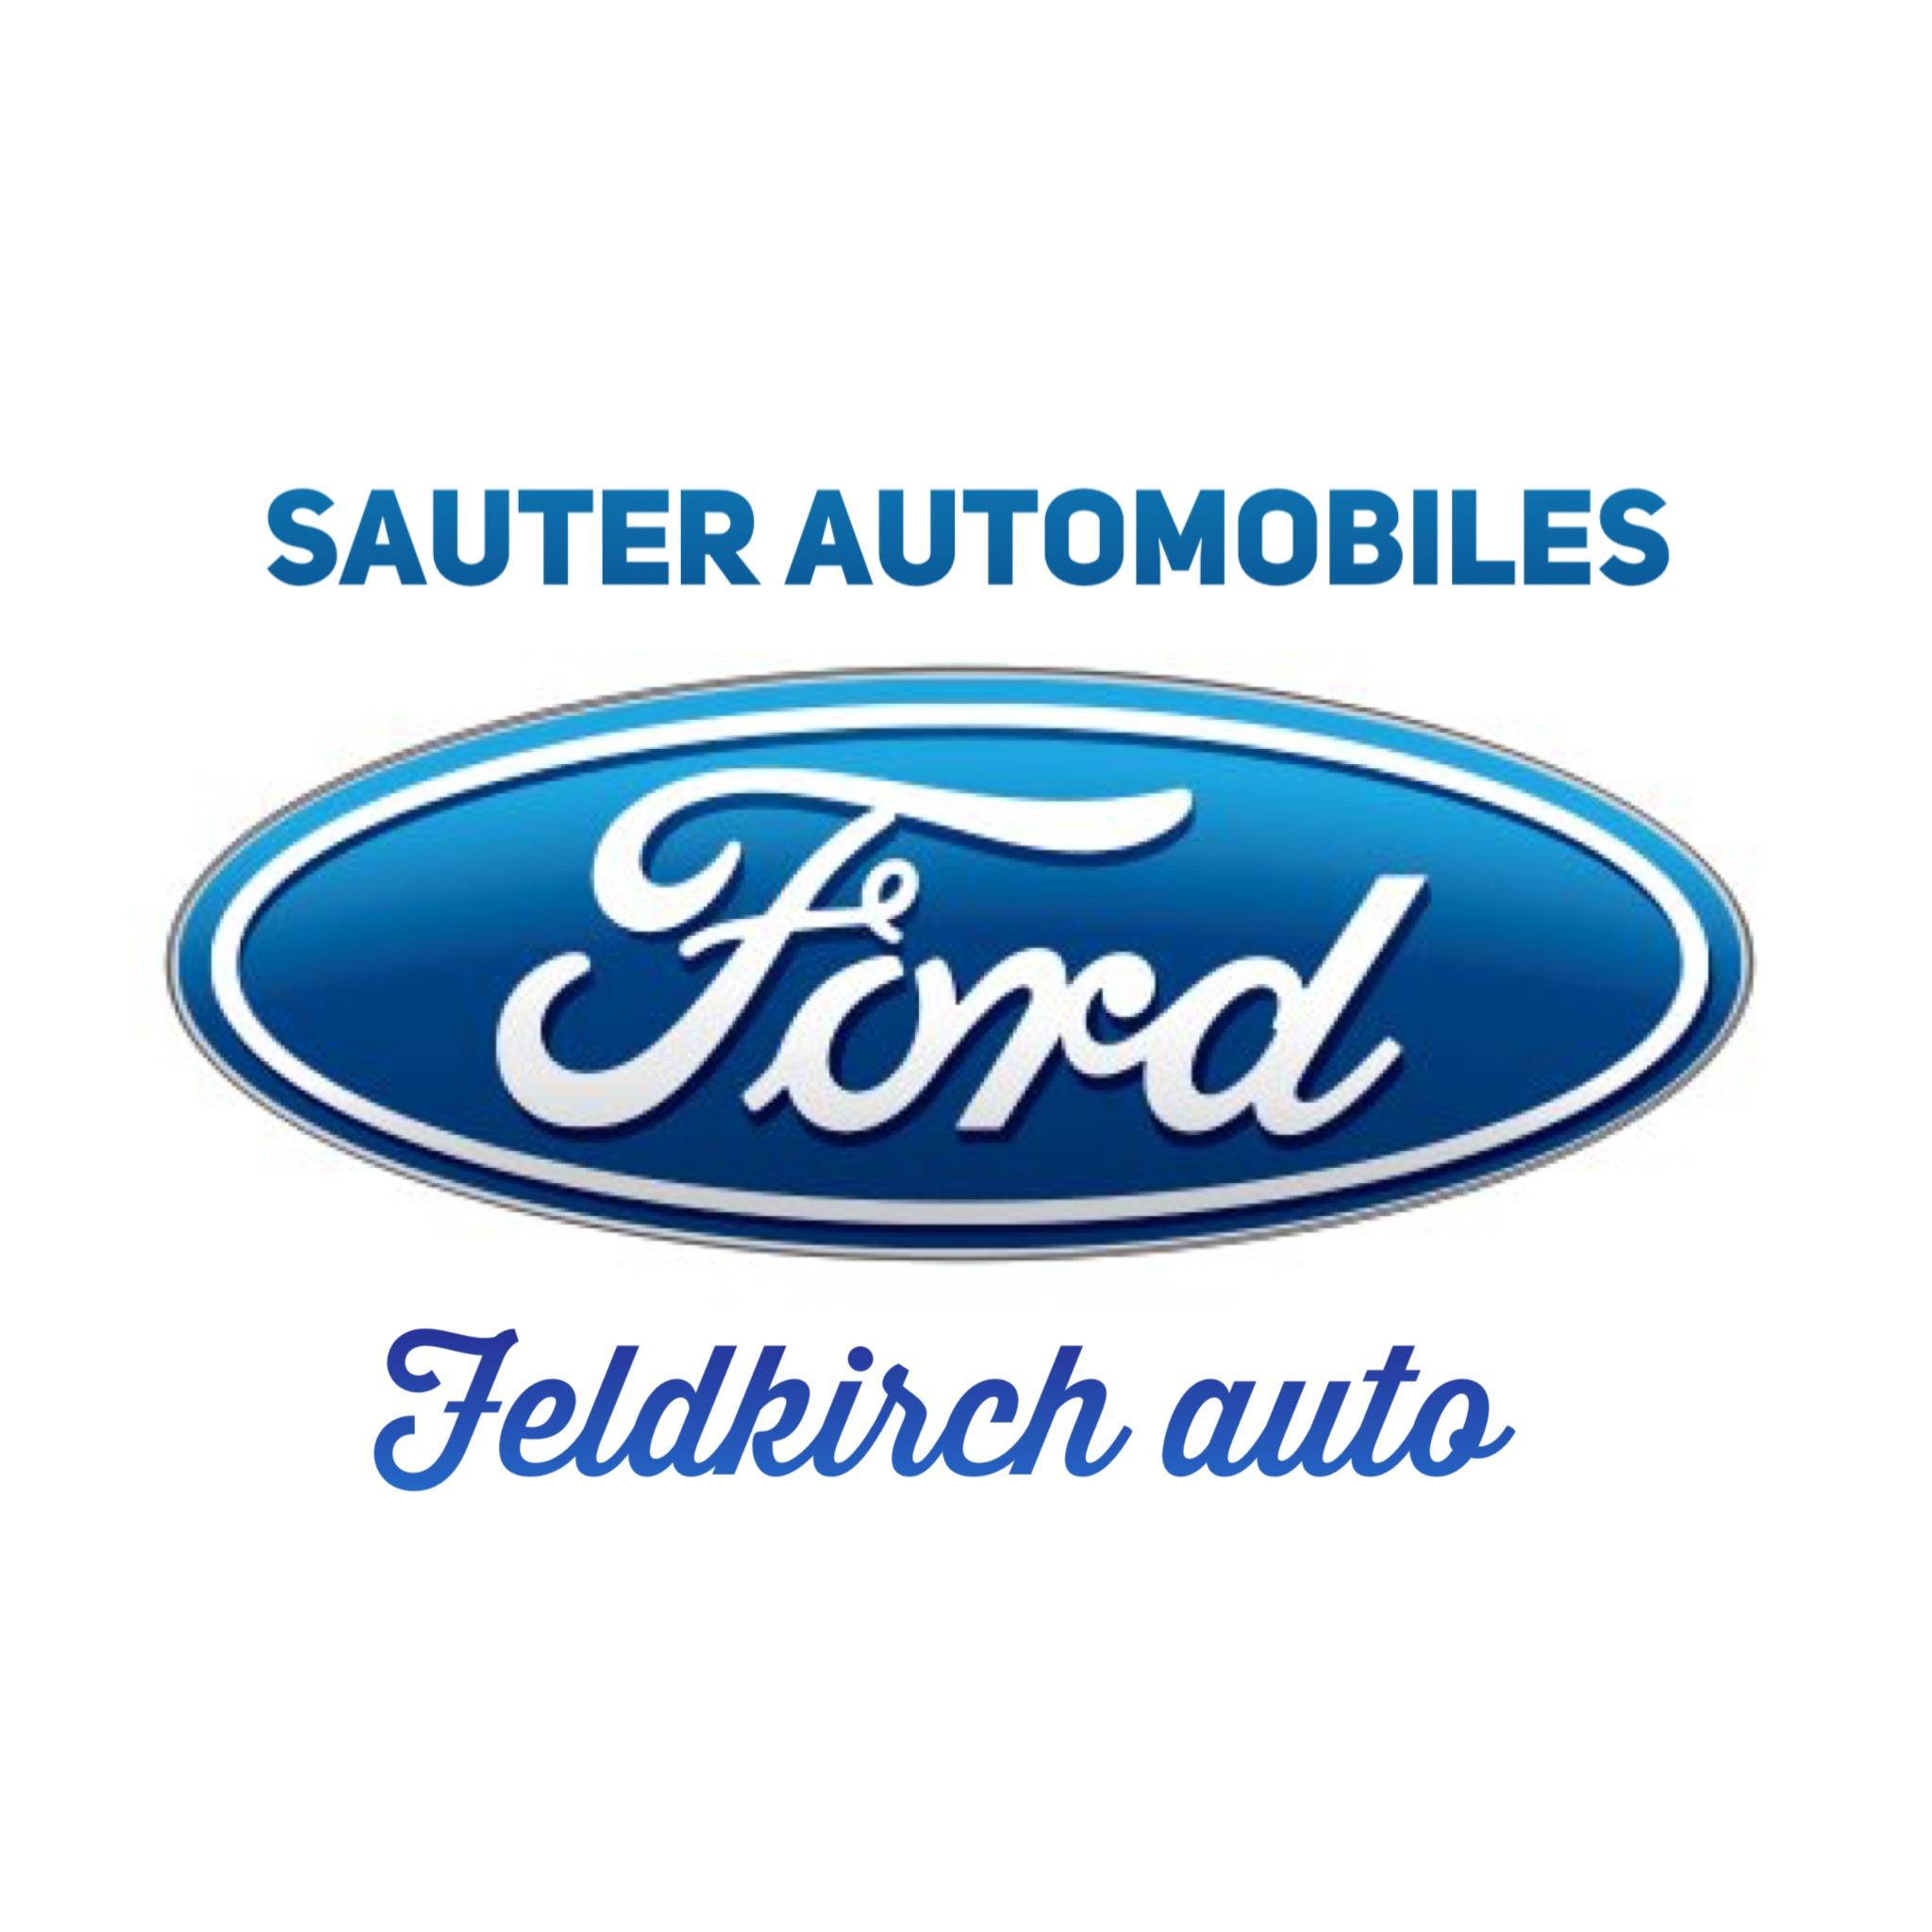 SAUTER Automobiles